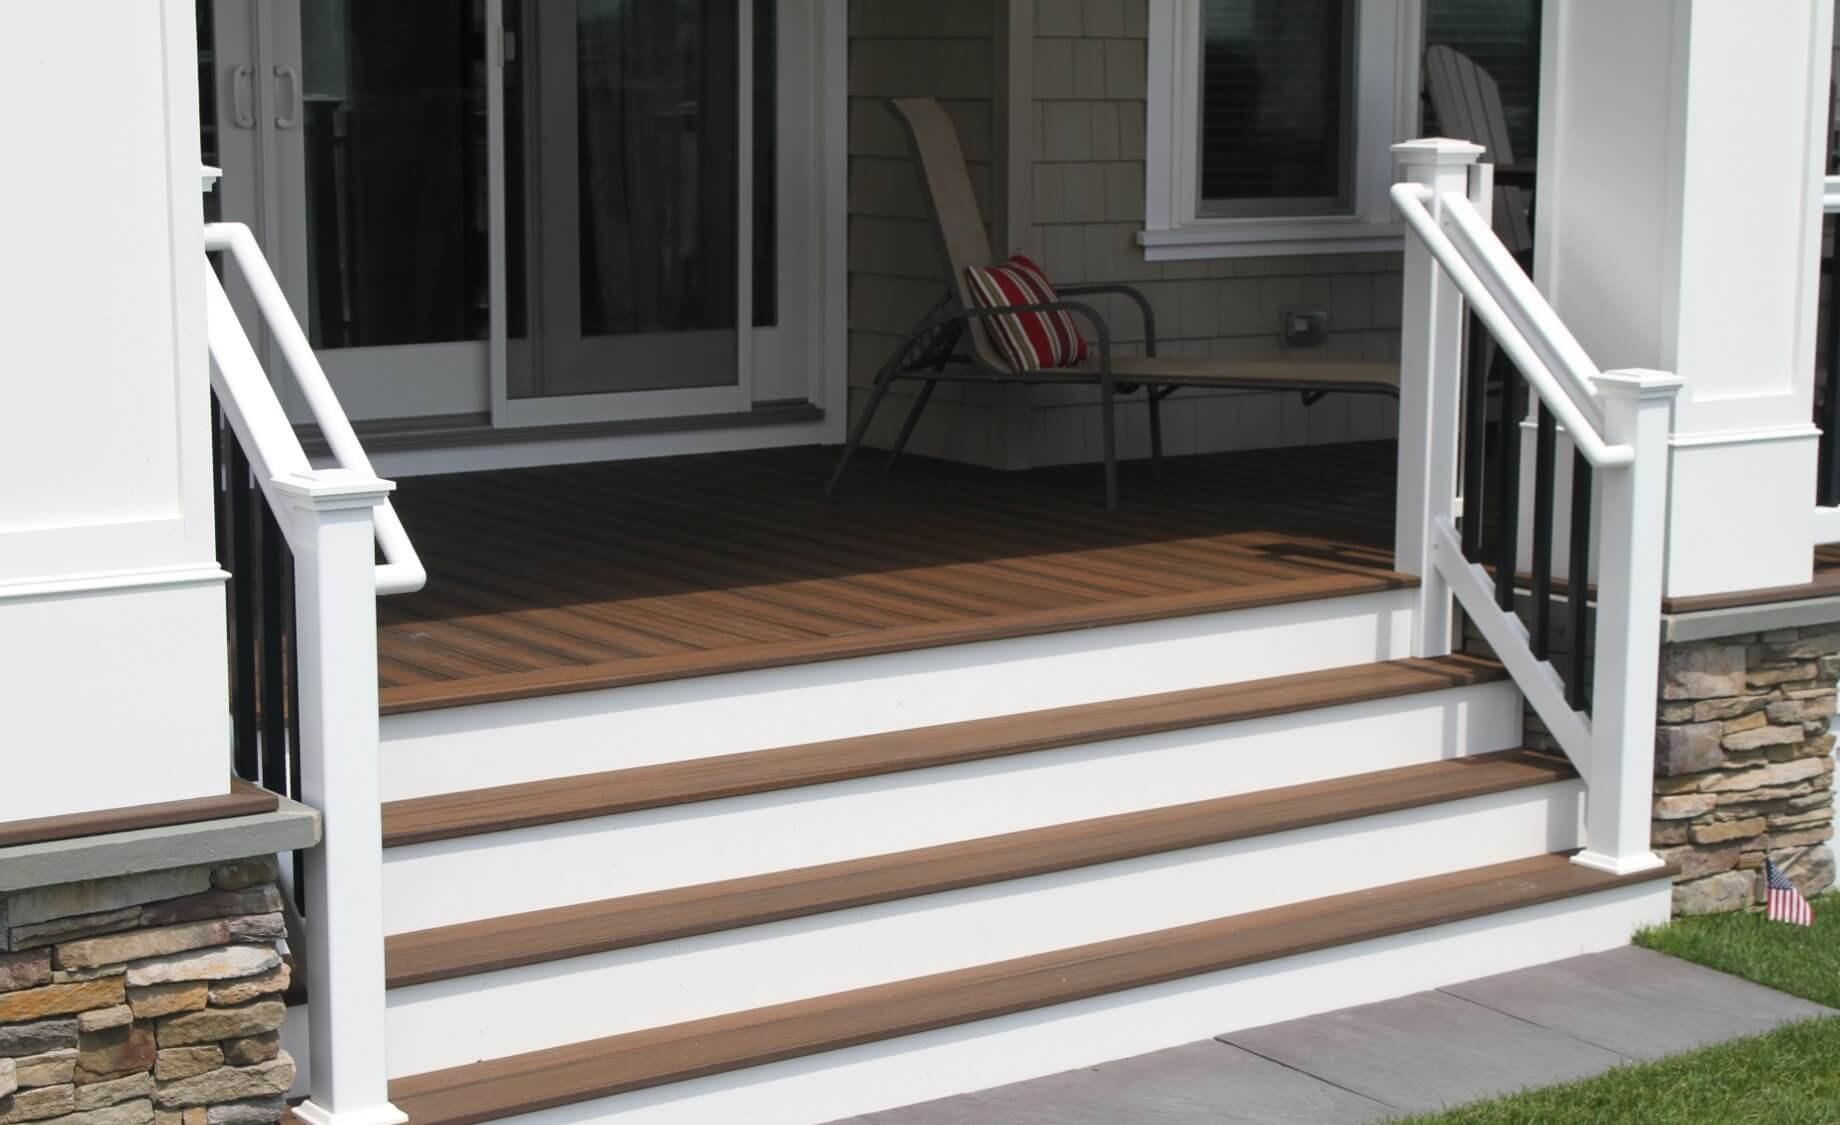 Ada Aluminum Handrail Superior Plastic Products Inc   Deluxe Stair And Railing   Houzz   Wood Railings   Wood   Railing Ltd   Deluxe Indoor